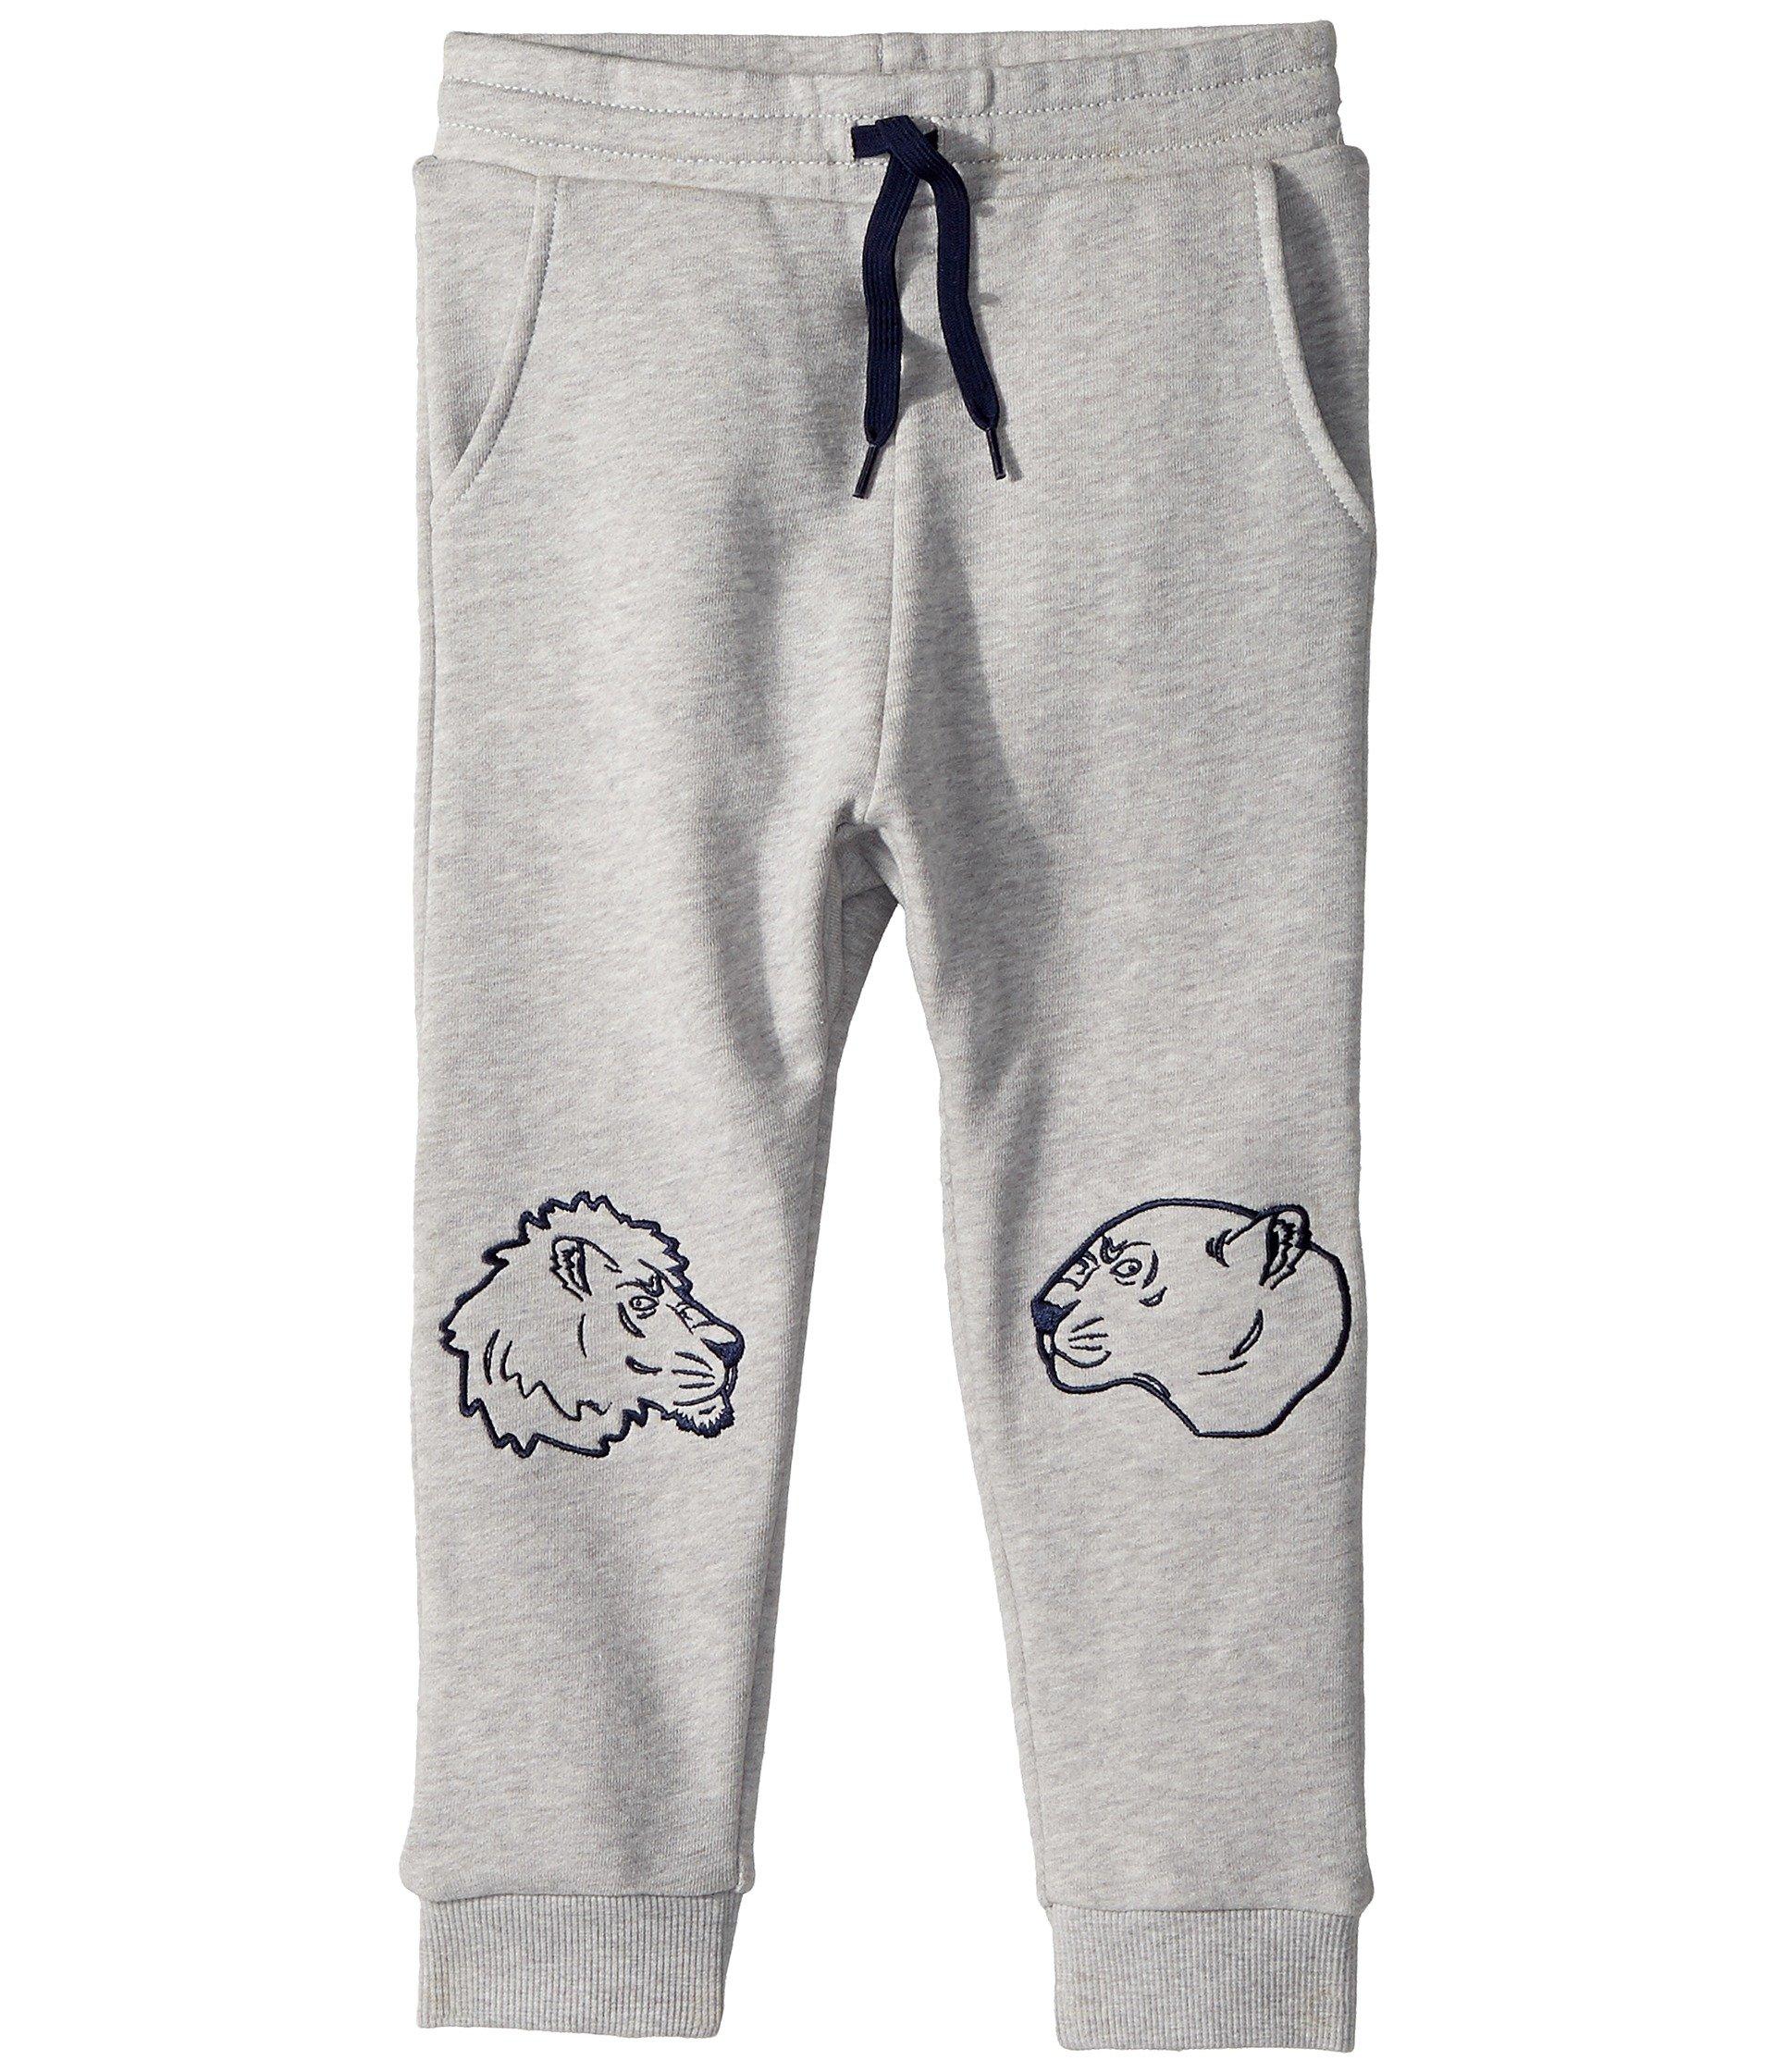 Kenzo Kids Clothing